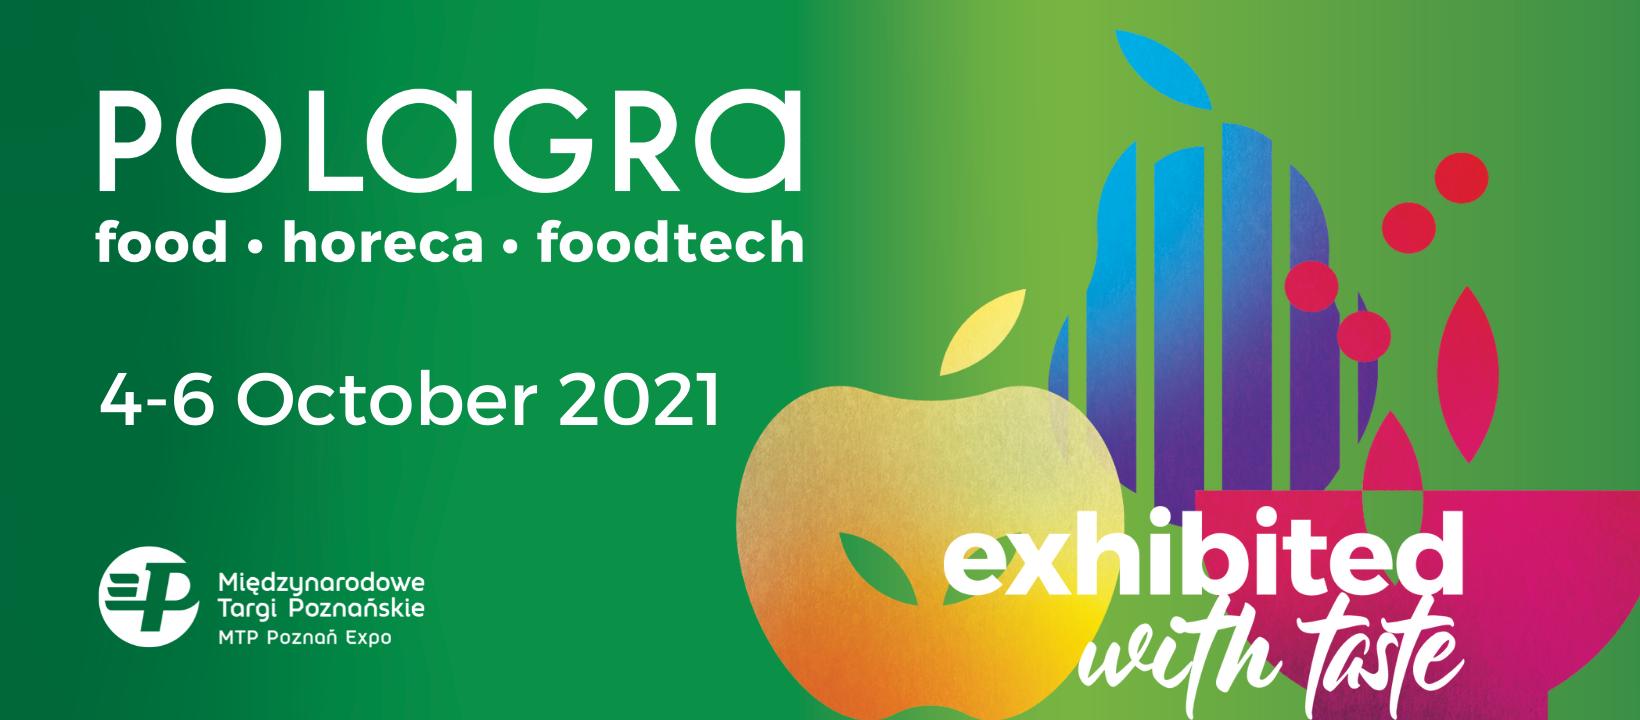 POLAGRA 2021 – exhibited with taste